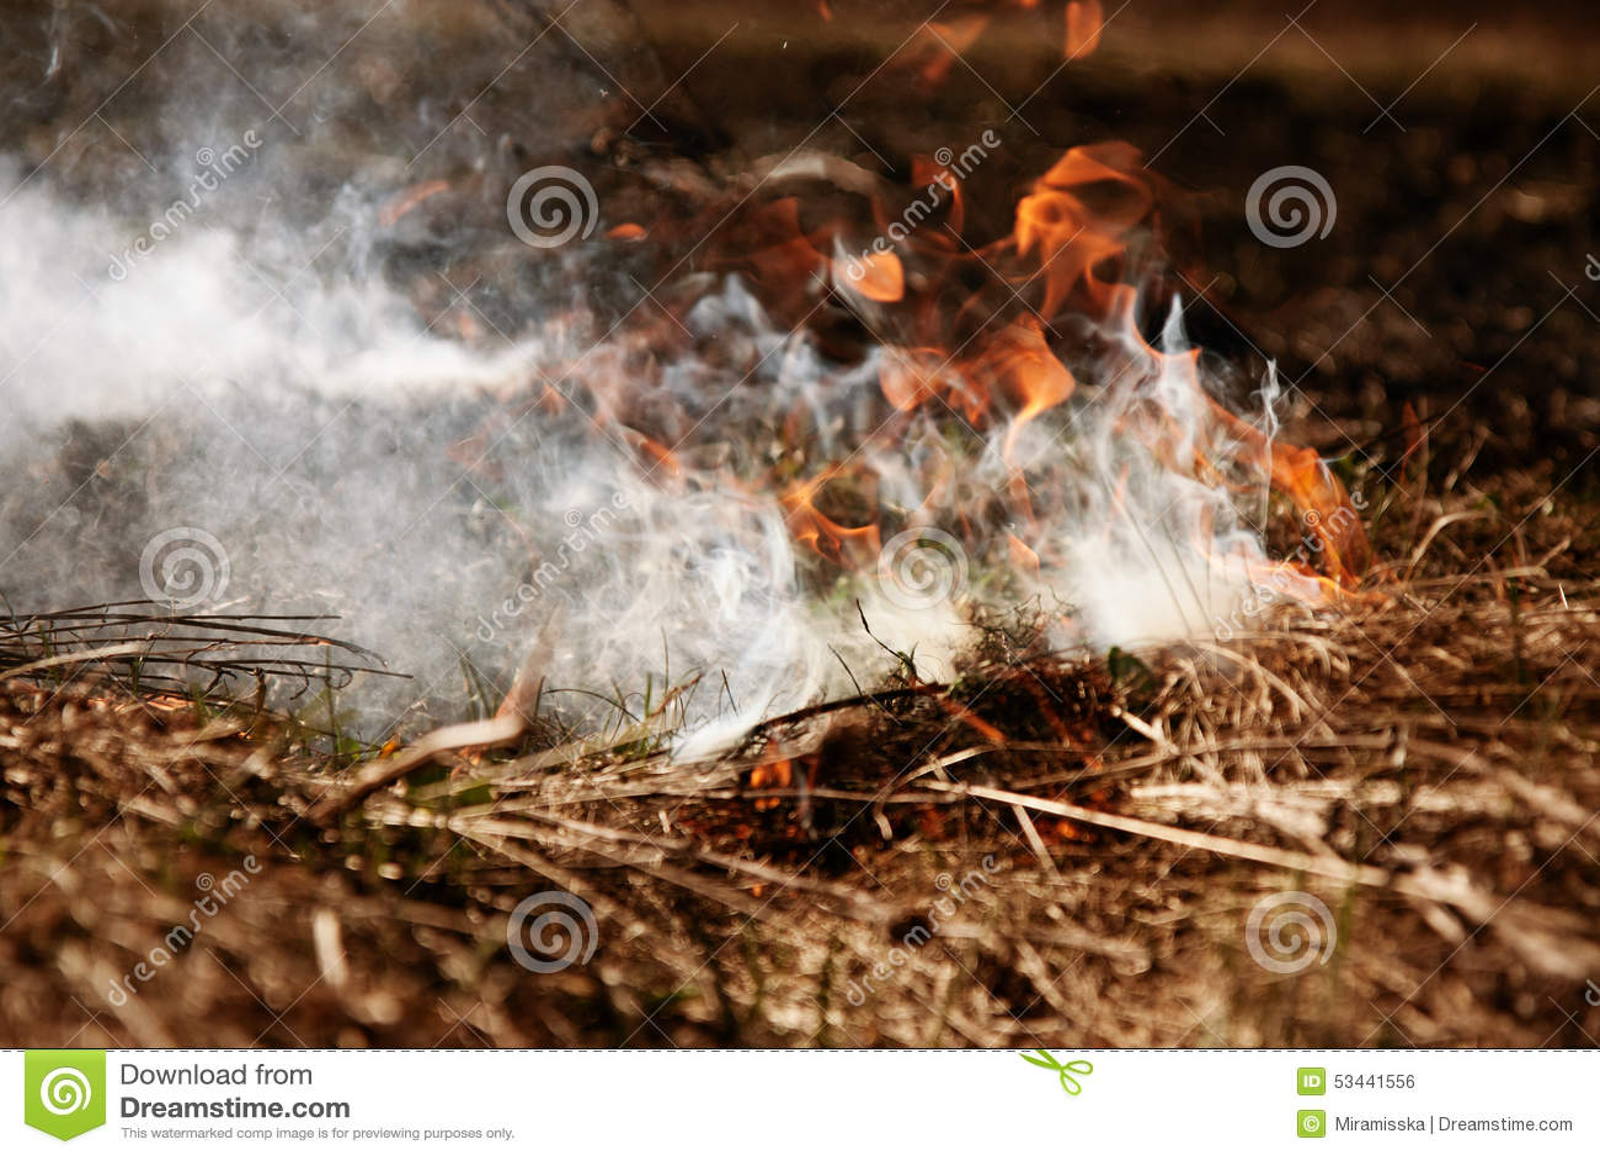 Wildfire Feuer Globale Erwärmung, Klimakatastrophe Conce